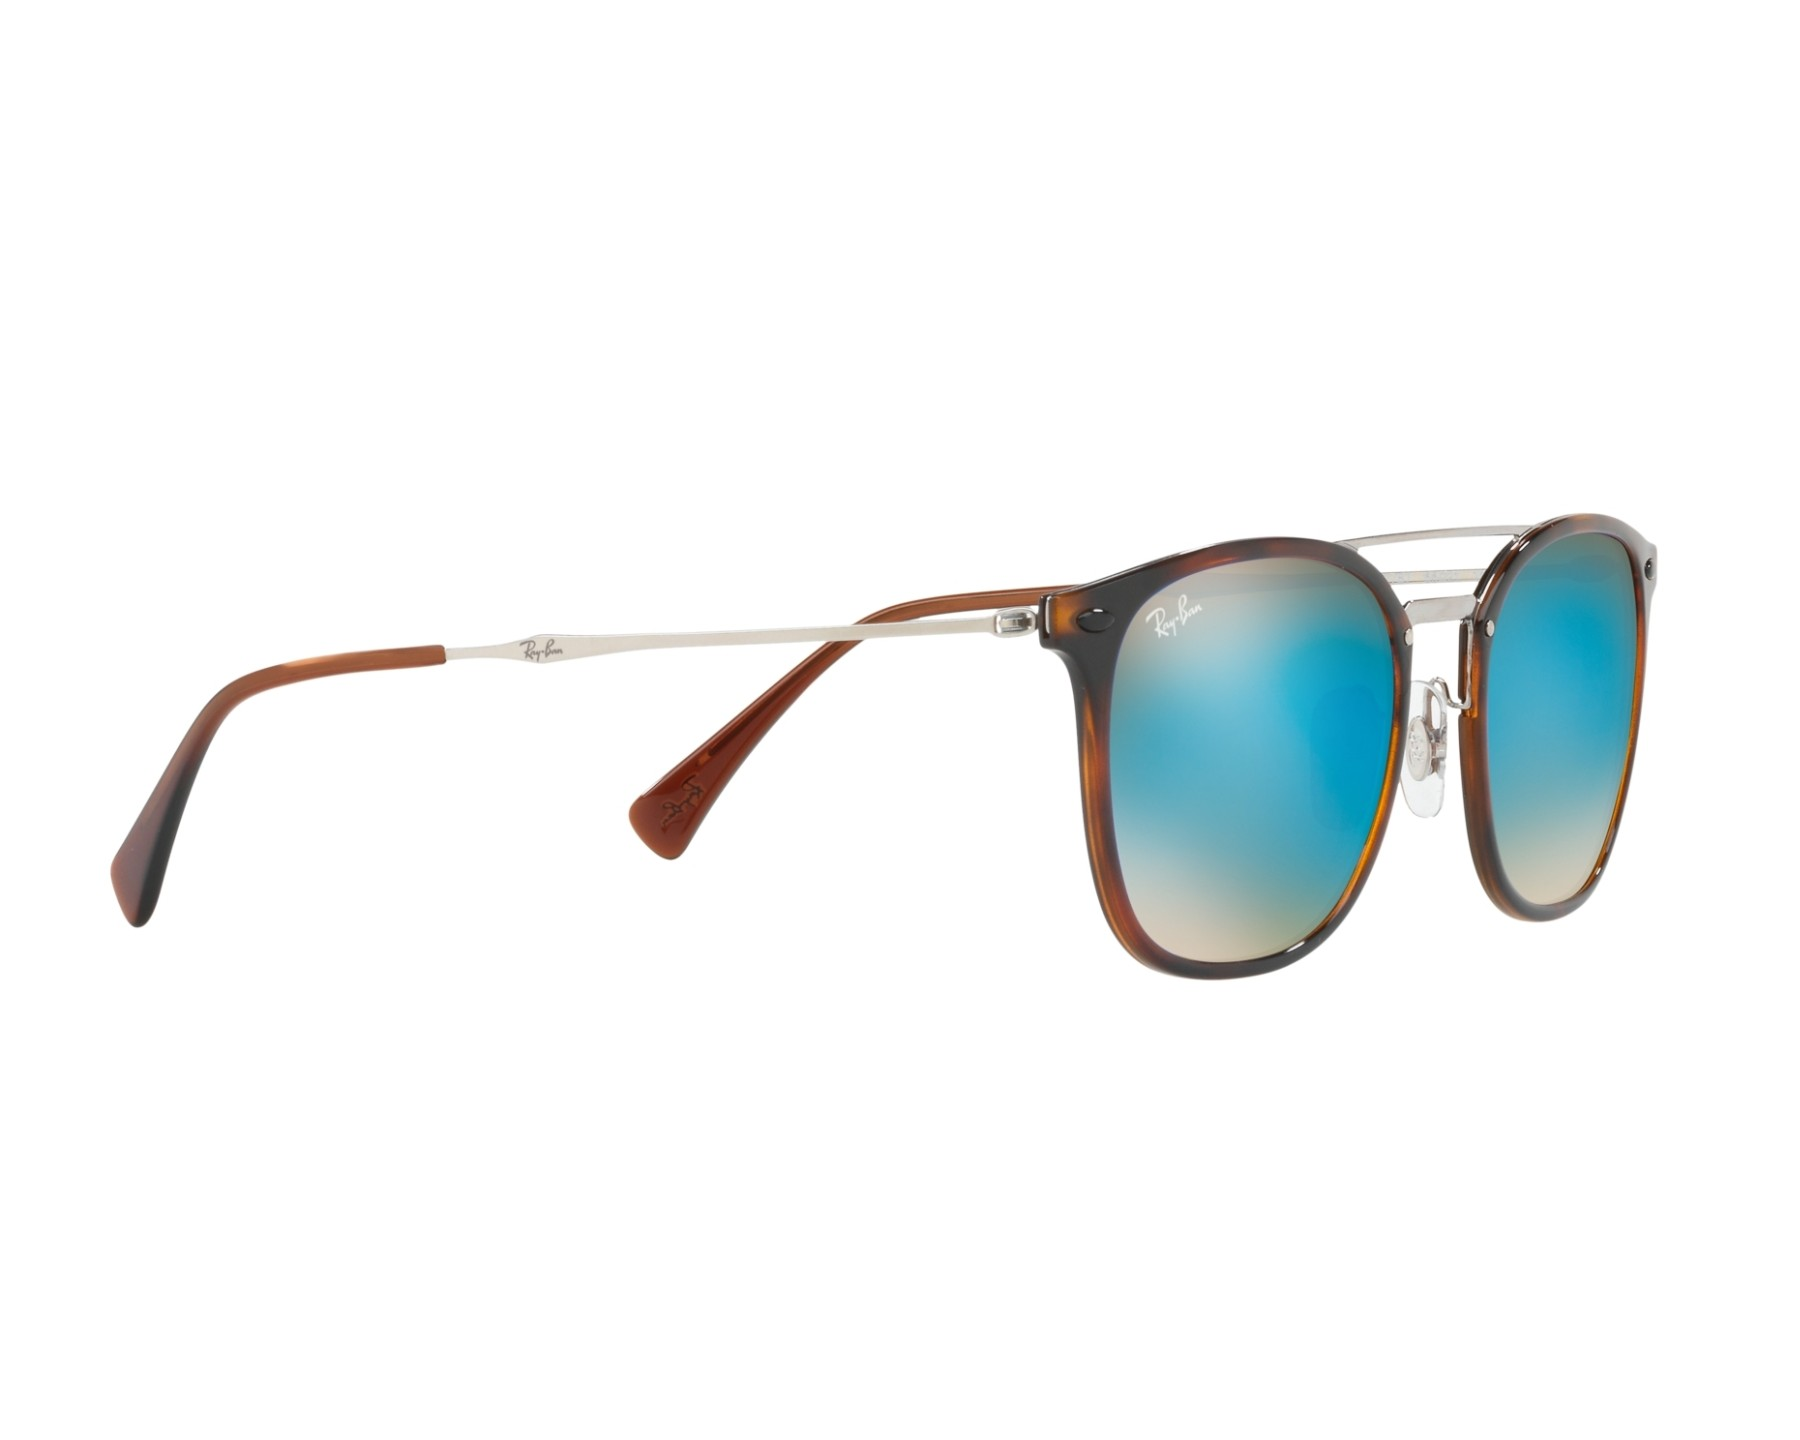 b44aa05299 Sunglasses Ray-Ban RB-4286 6257B7 55-21 Havana Silver 360 degree view